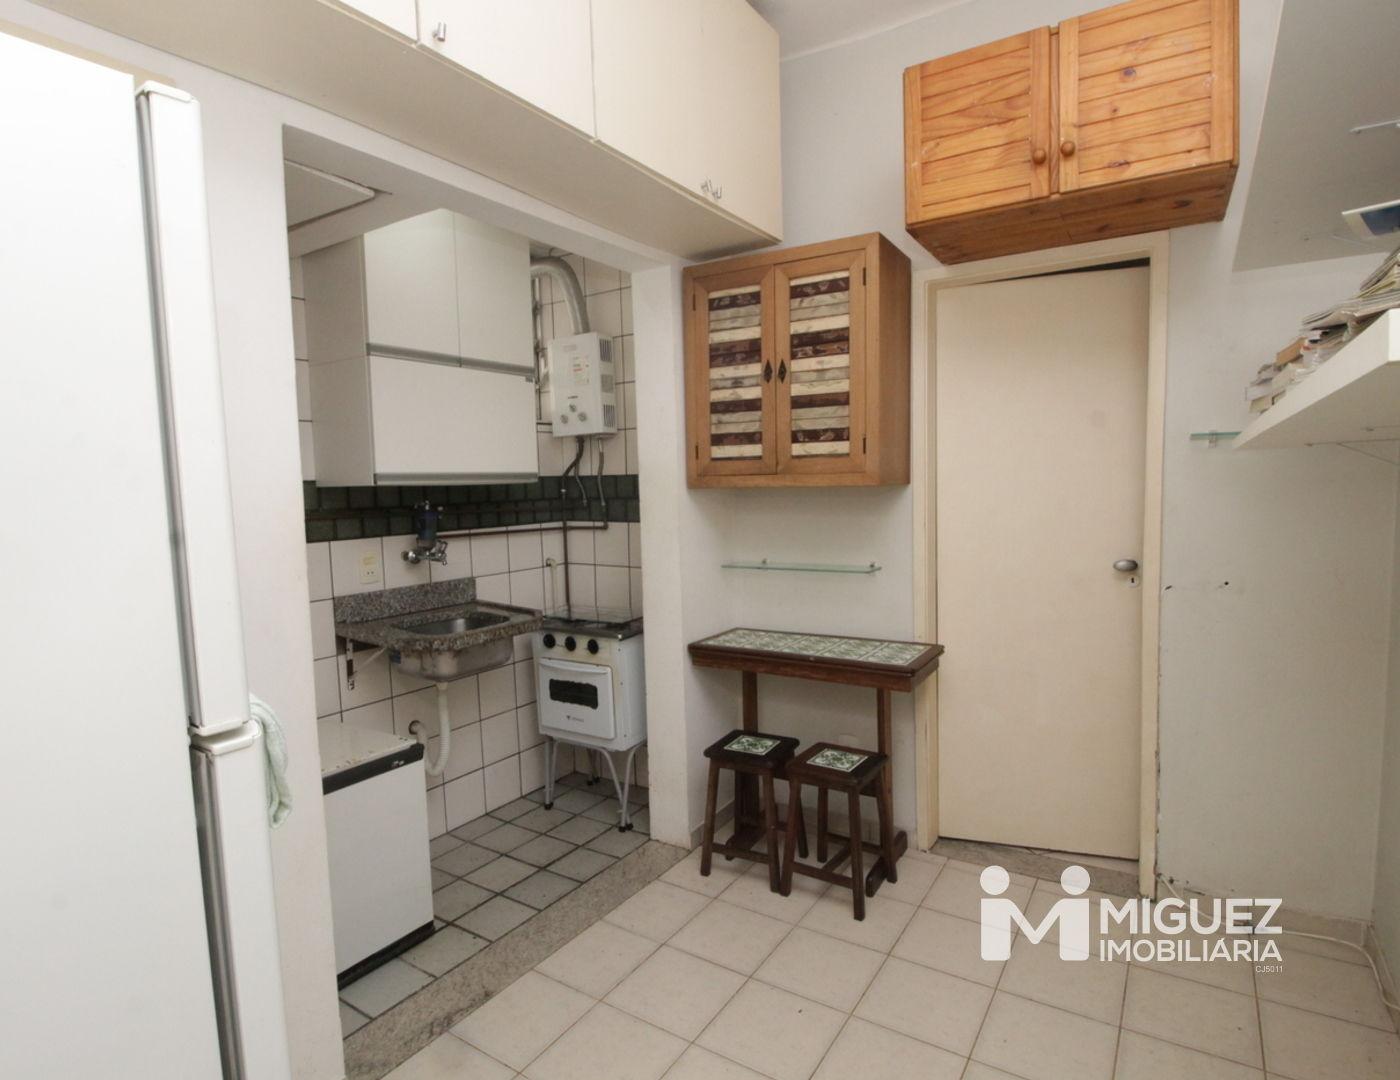 Conjugado, aluguel, Rua Humberto de Campos - Leblon , Rio de janeiro